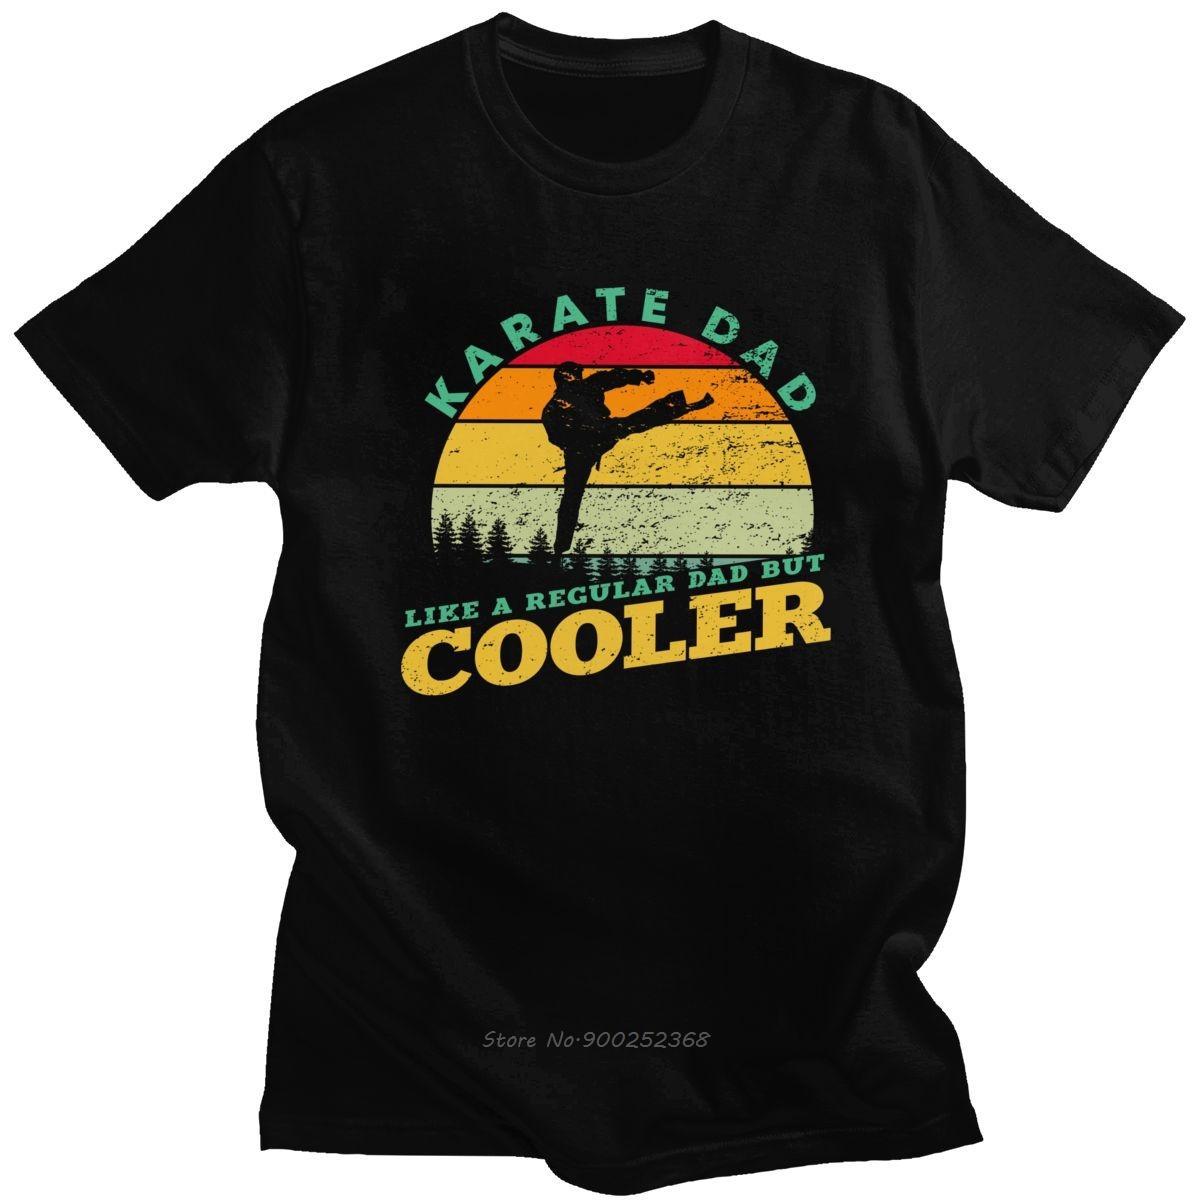 Vintage Karate Papà Tshirt Uomini Maniche corte in cotone T-shirt retrò Stampa Arti marziali Top Karateka Tee Shirts Harajuku regalo